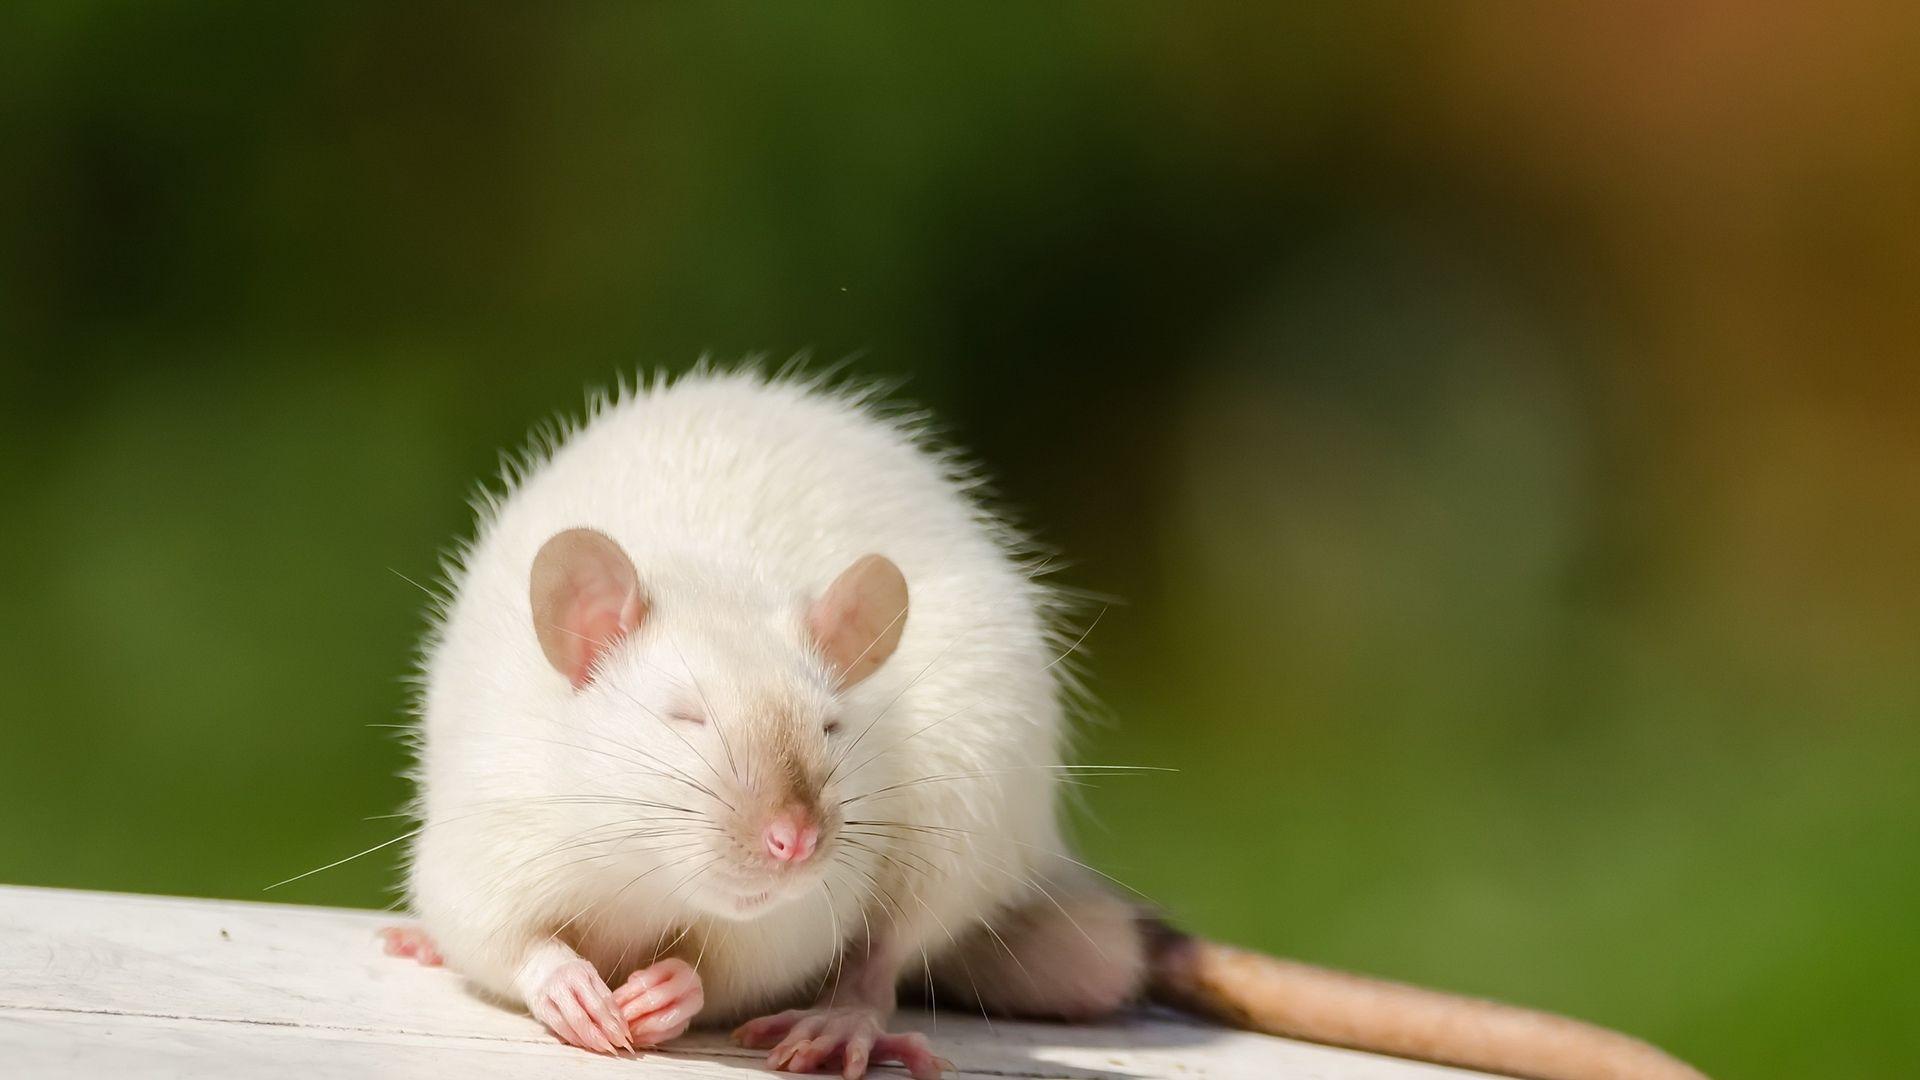 Christmas White Rat HD Wallpaper